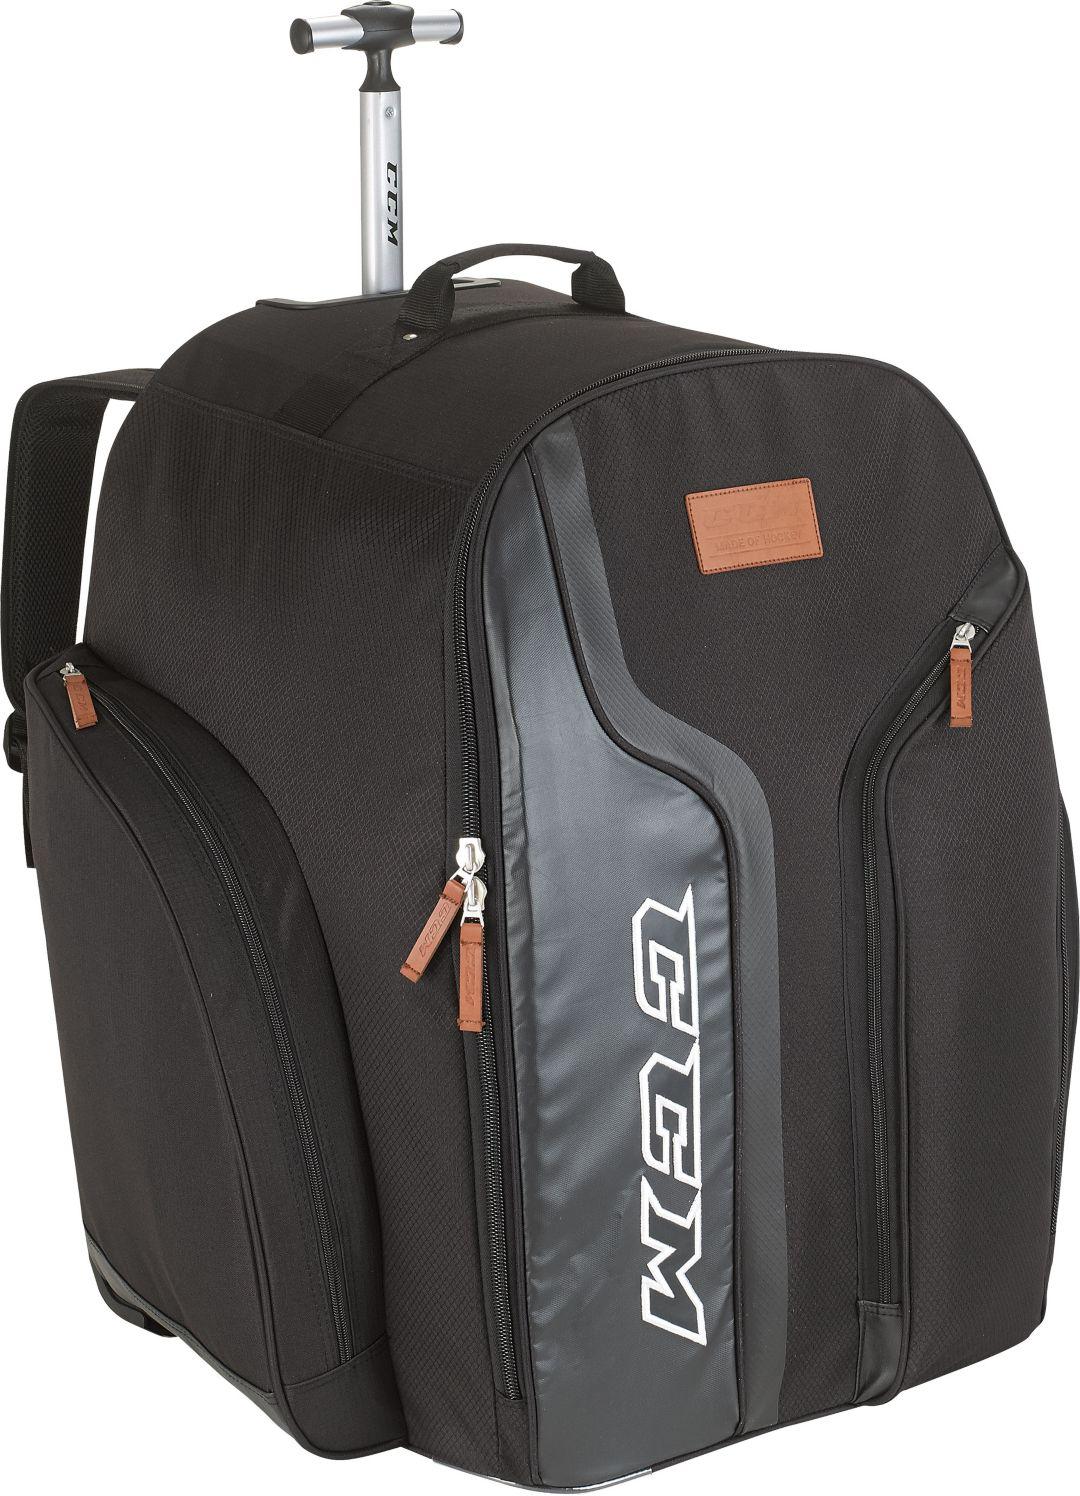 Ccm 290 Medium Player Wheeled Hockey Backpack